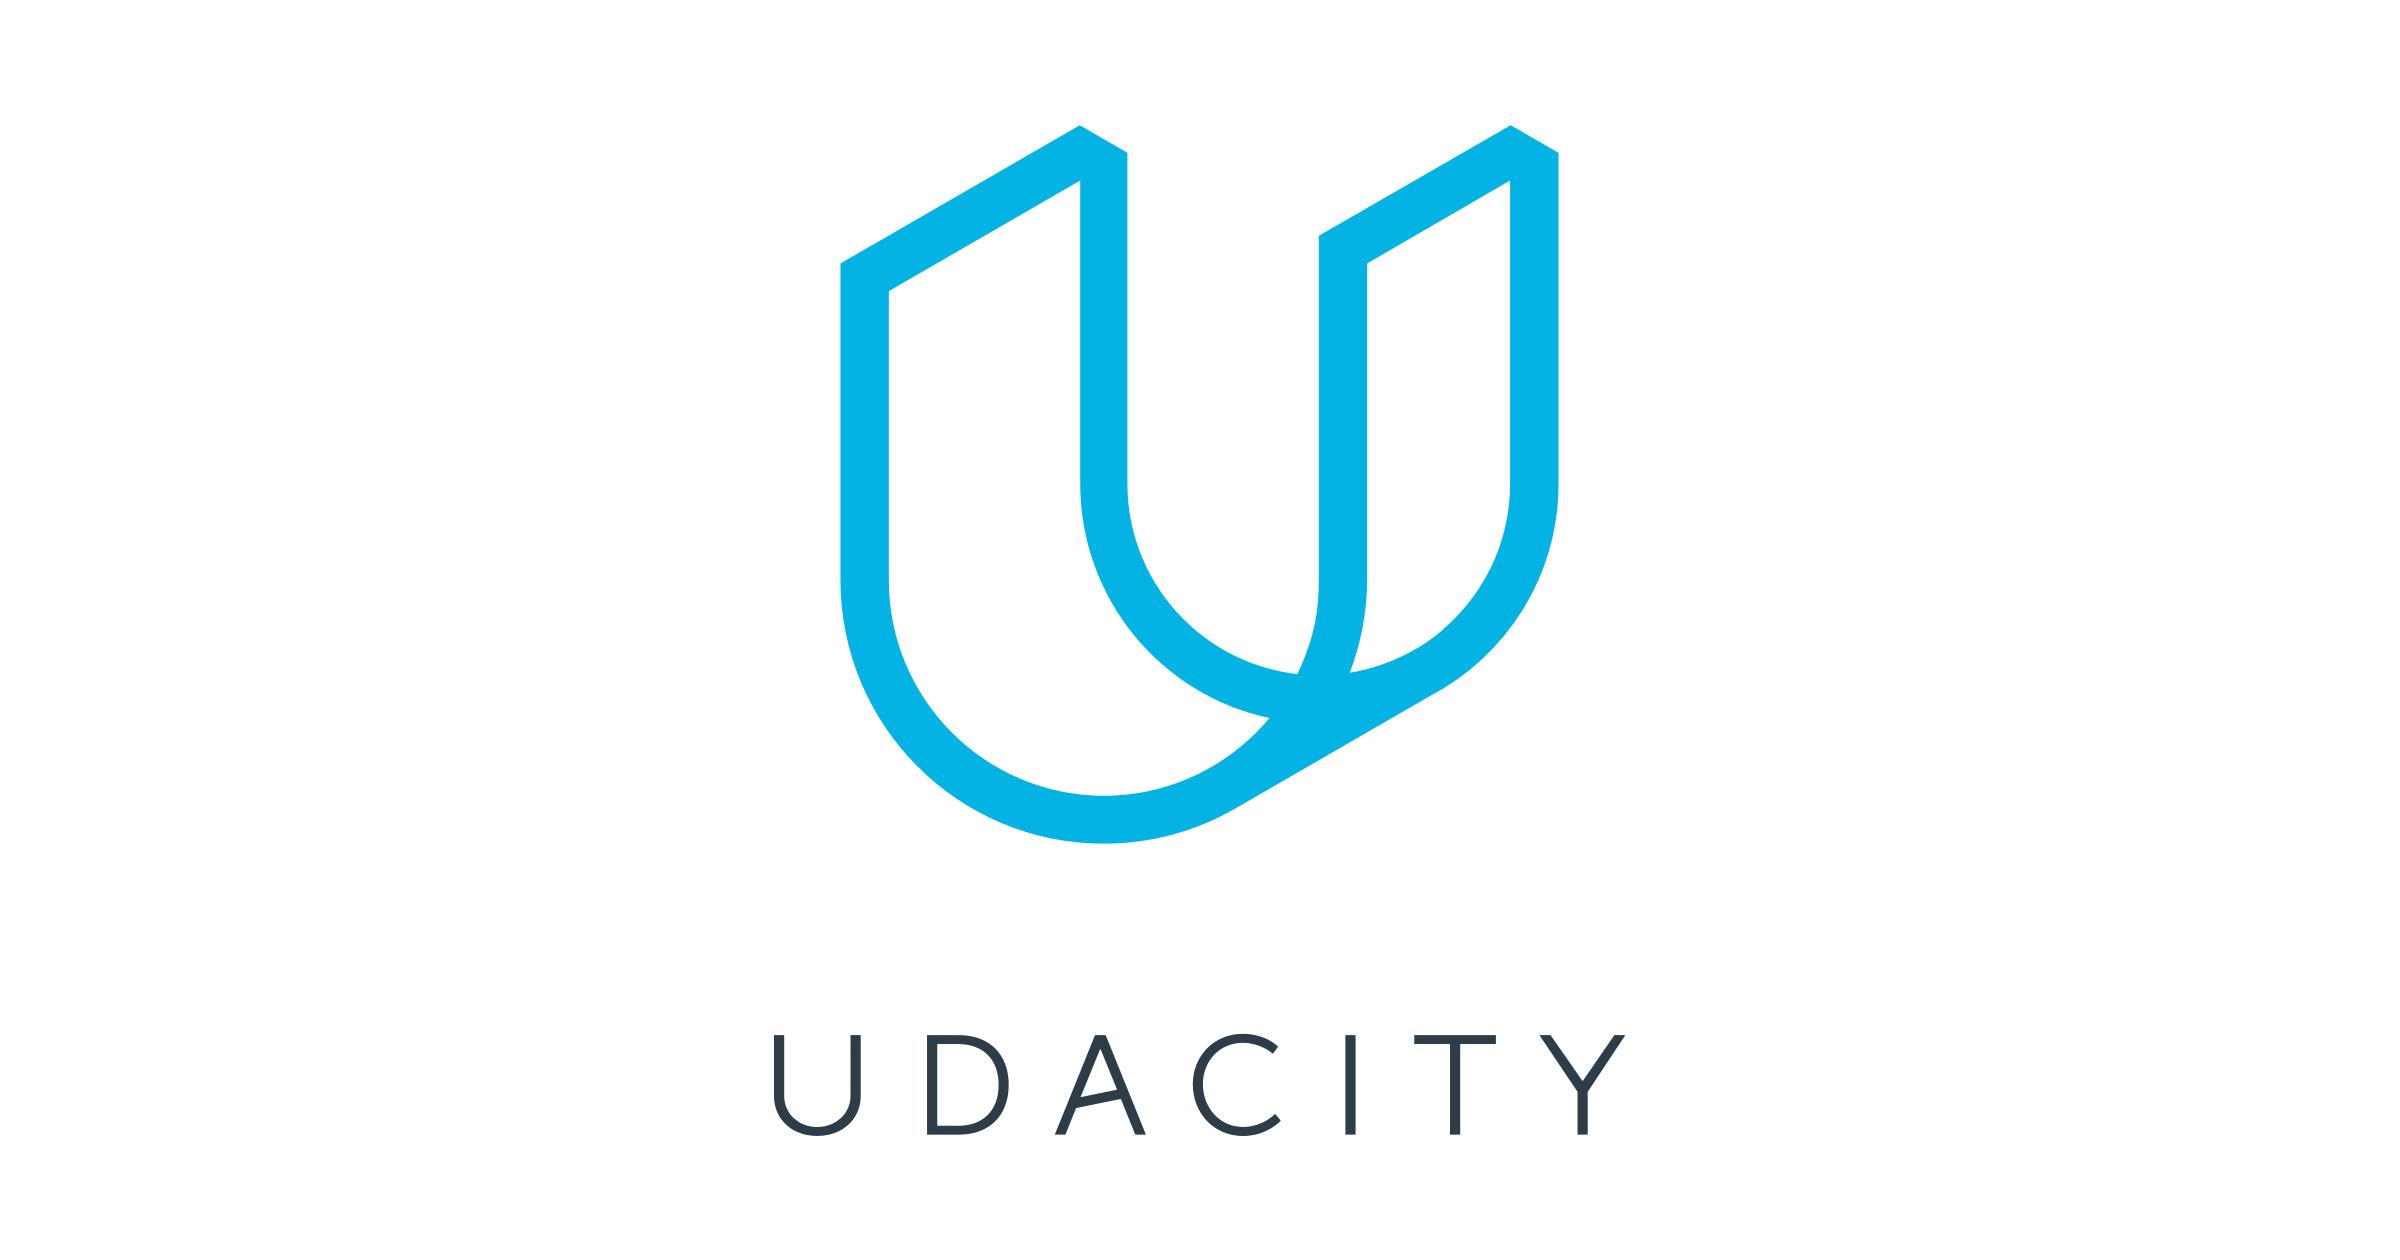 udacity优惠券,udacity现金券领取